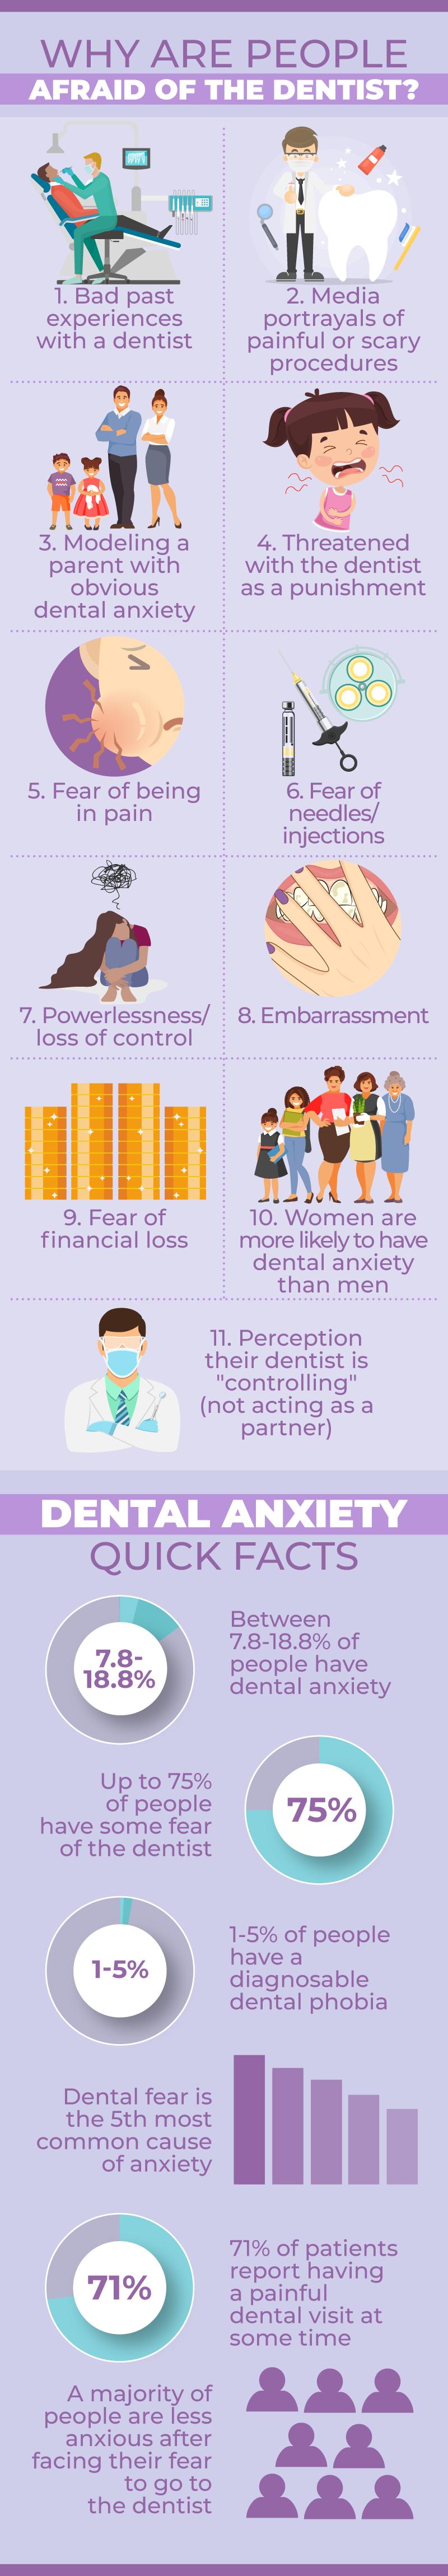 dental-fear-anxiety-statistics-causes